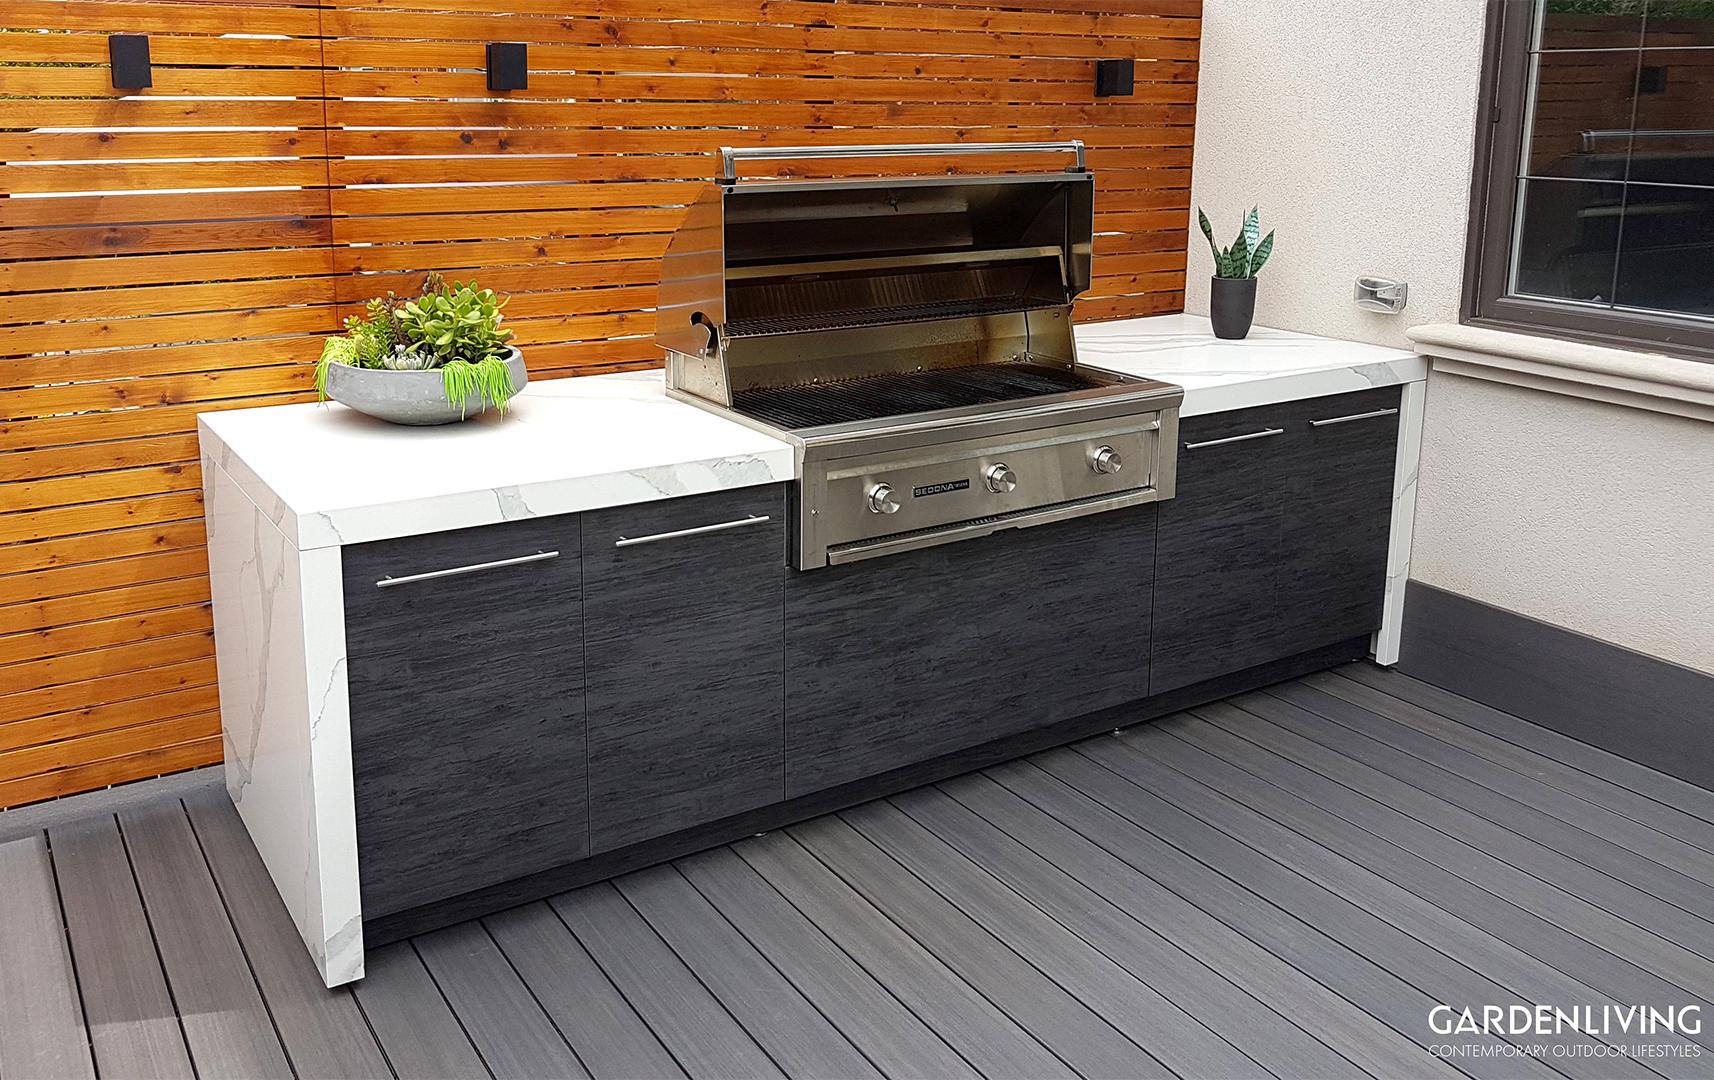 Garden Living Outdoor Kitchen 3.jpg